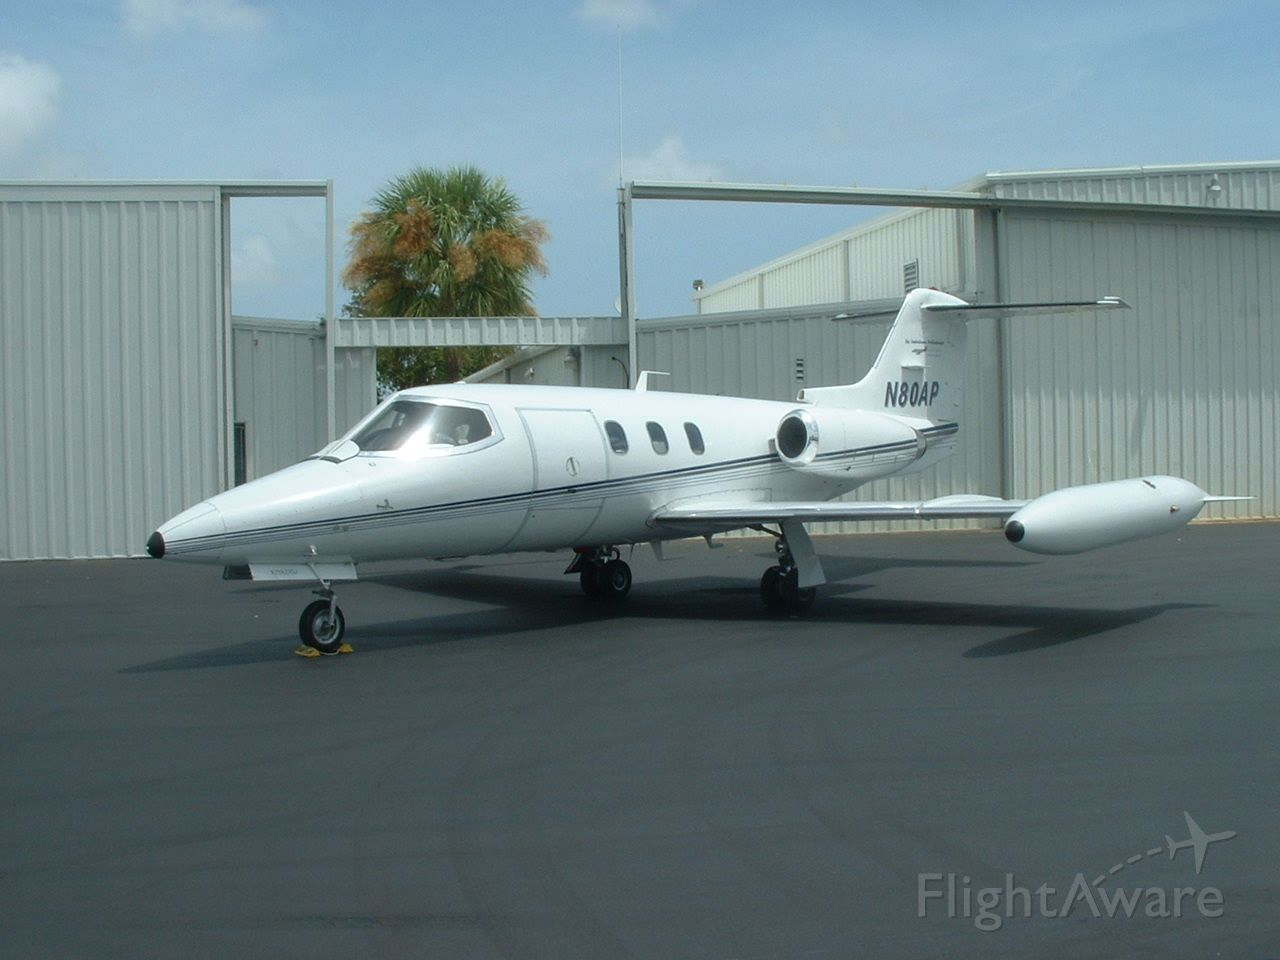 Learjet 24 (N80AP) - Air Ambulance Professionals